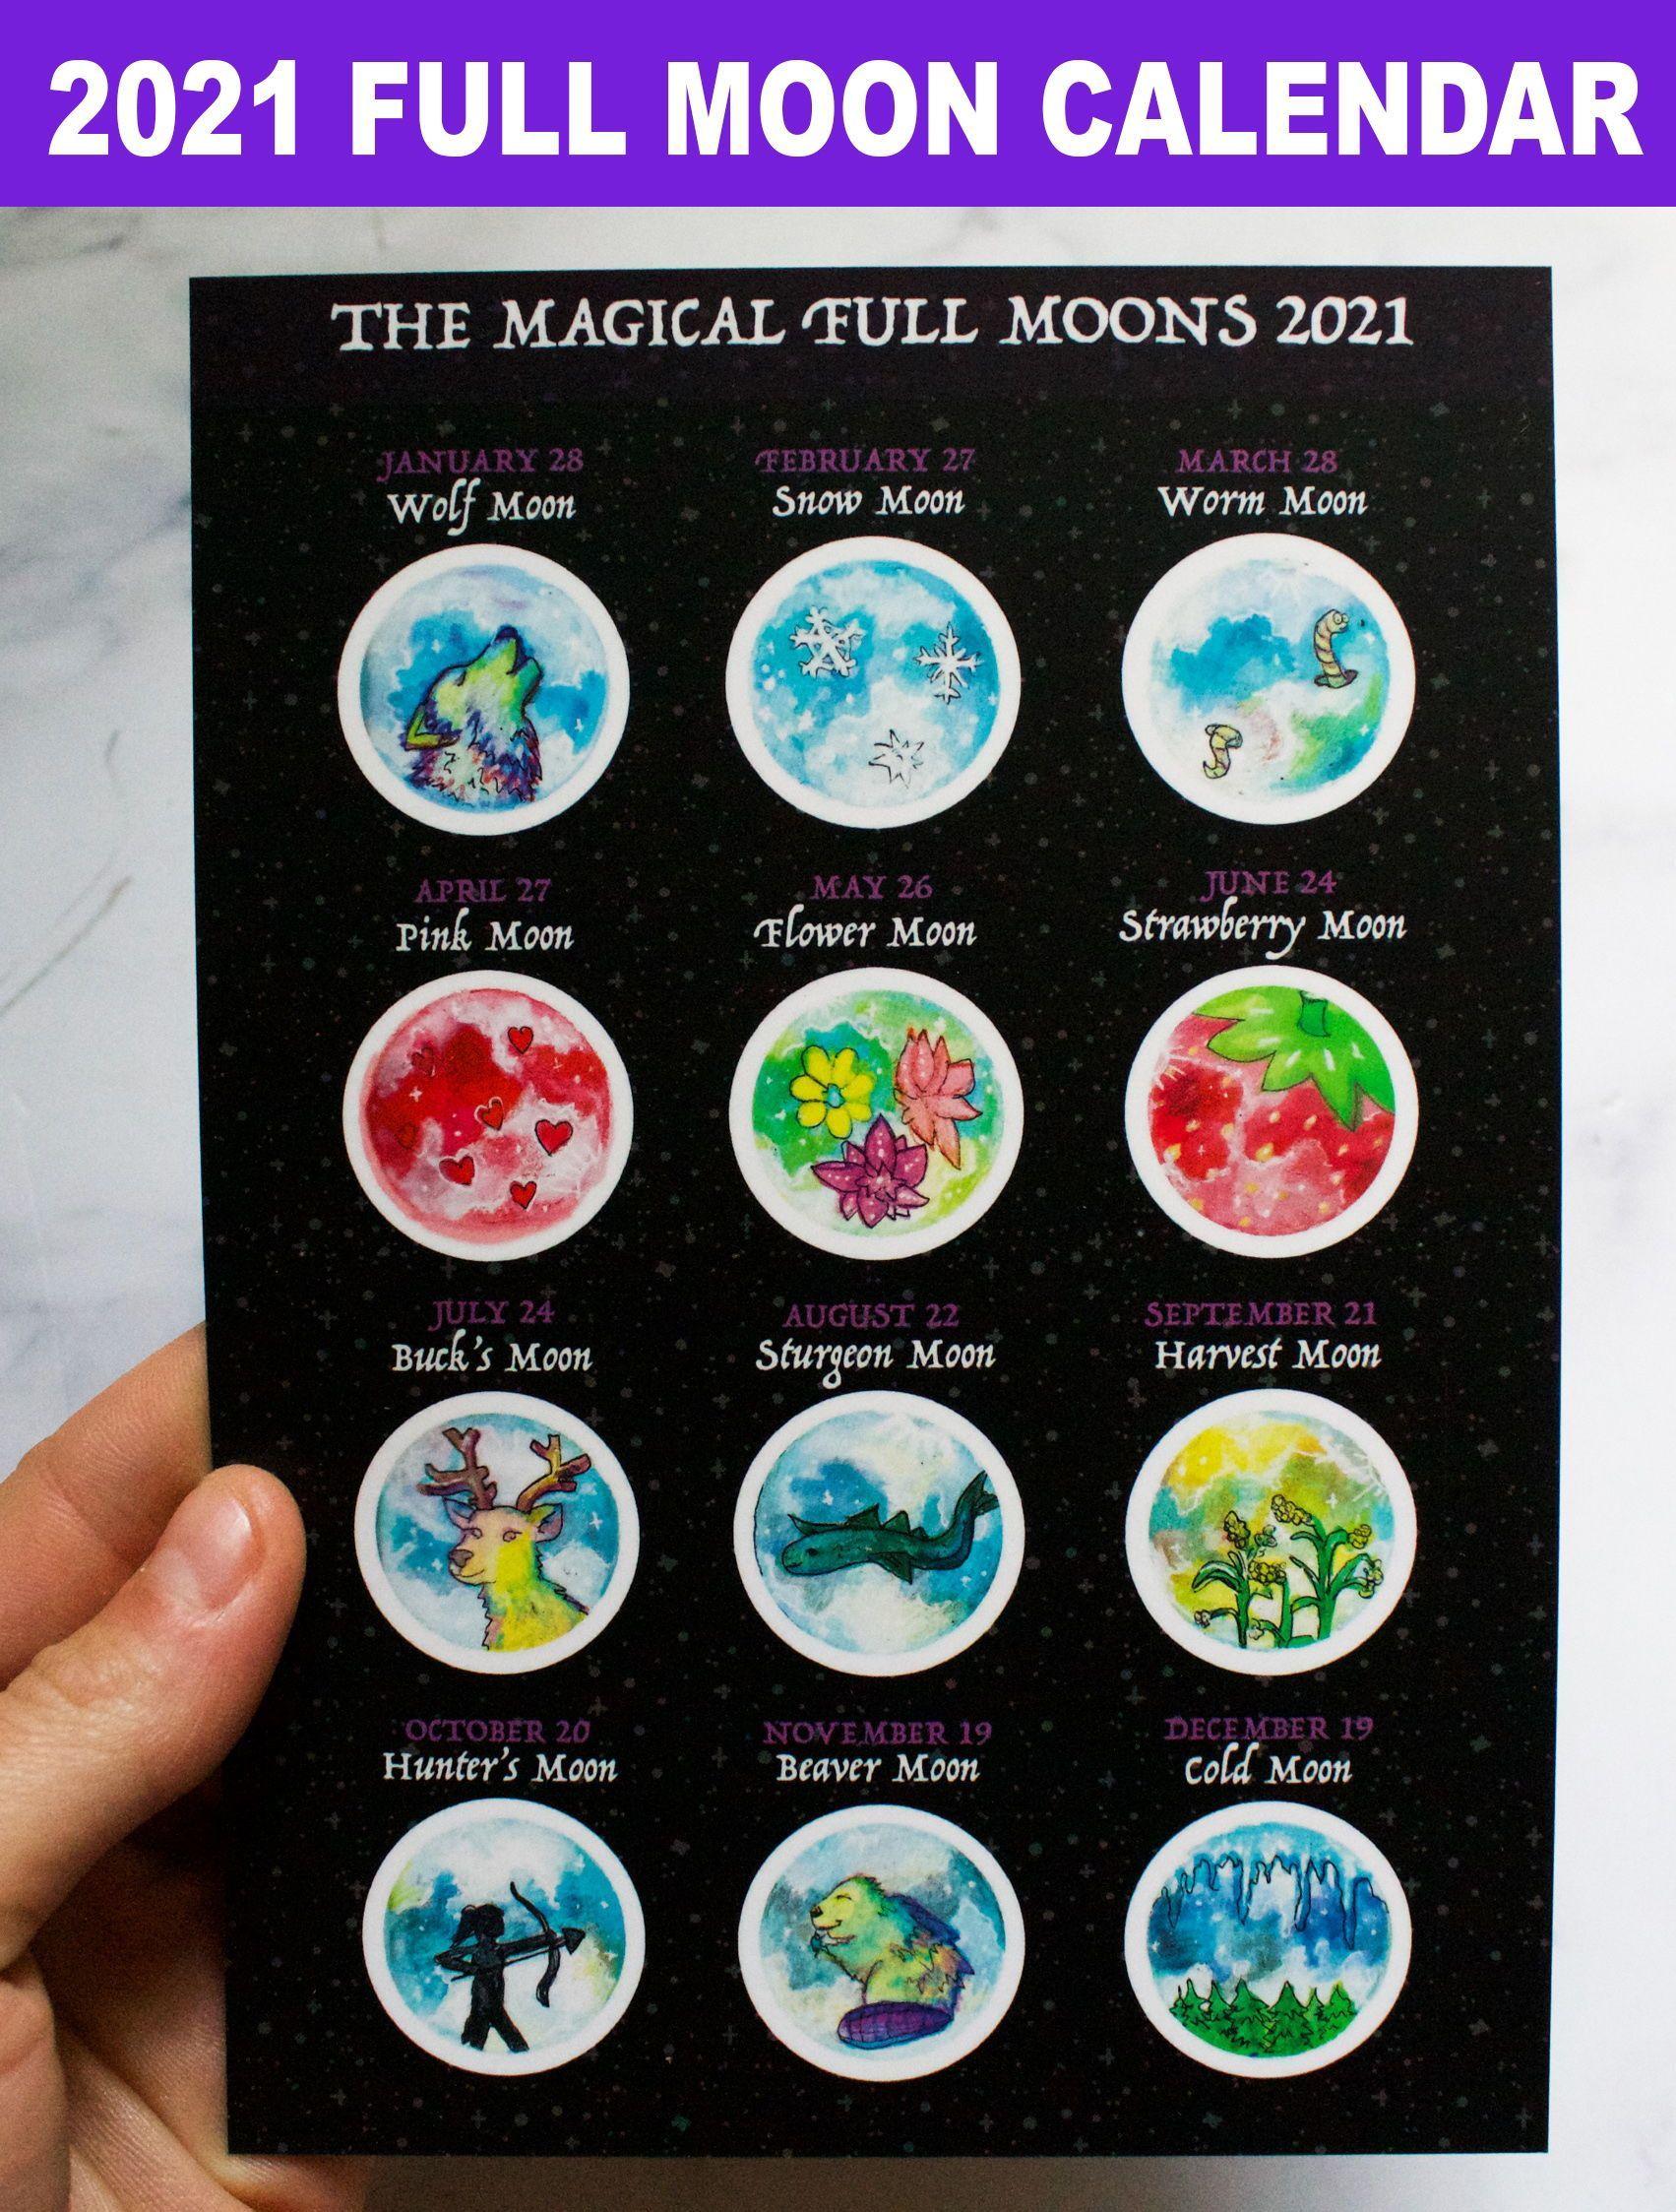 20 Magic Full Moon Lunar Calendar   Traditional Full Moon Names ...